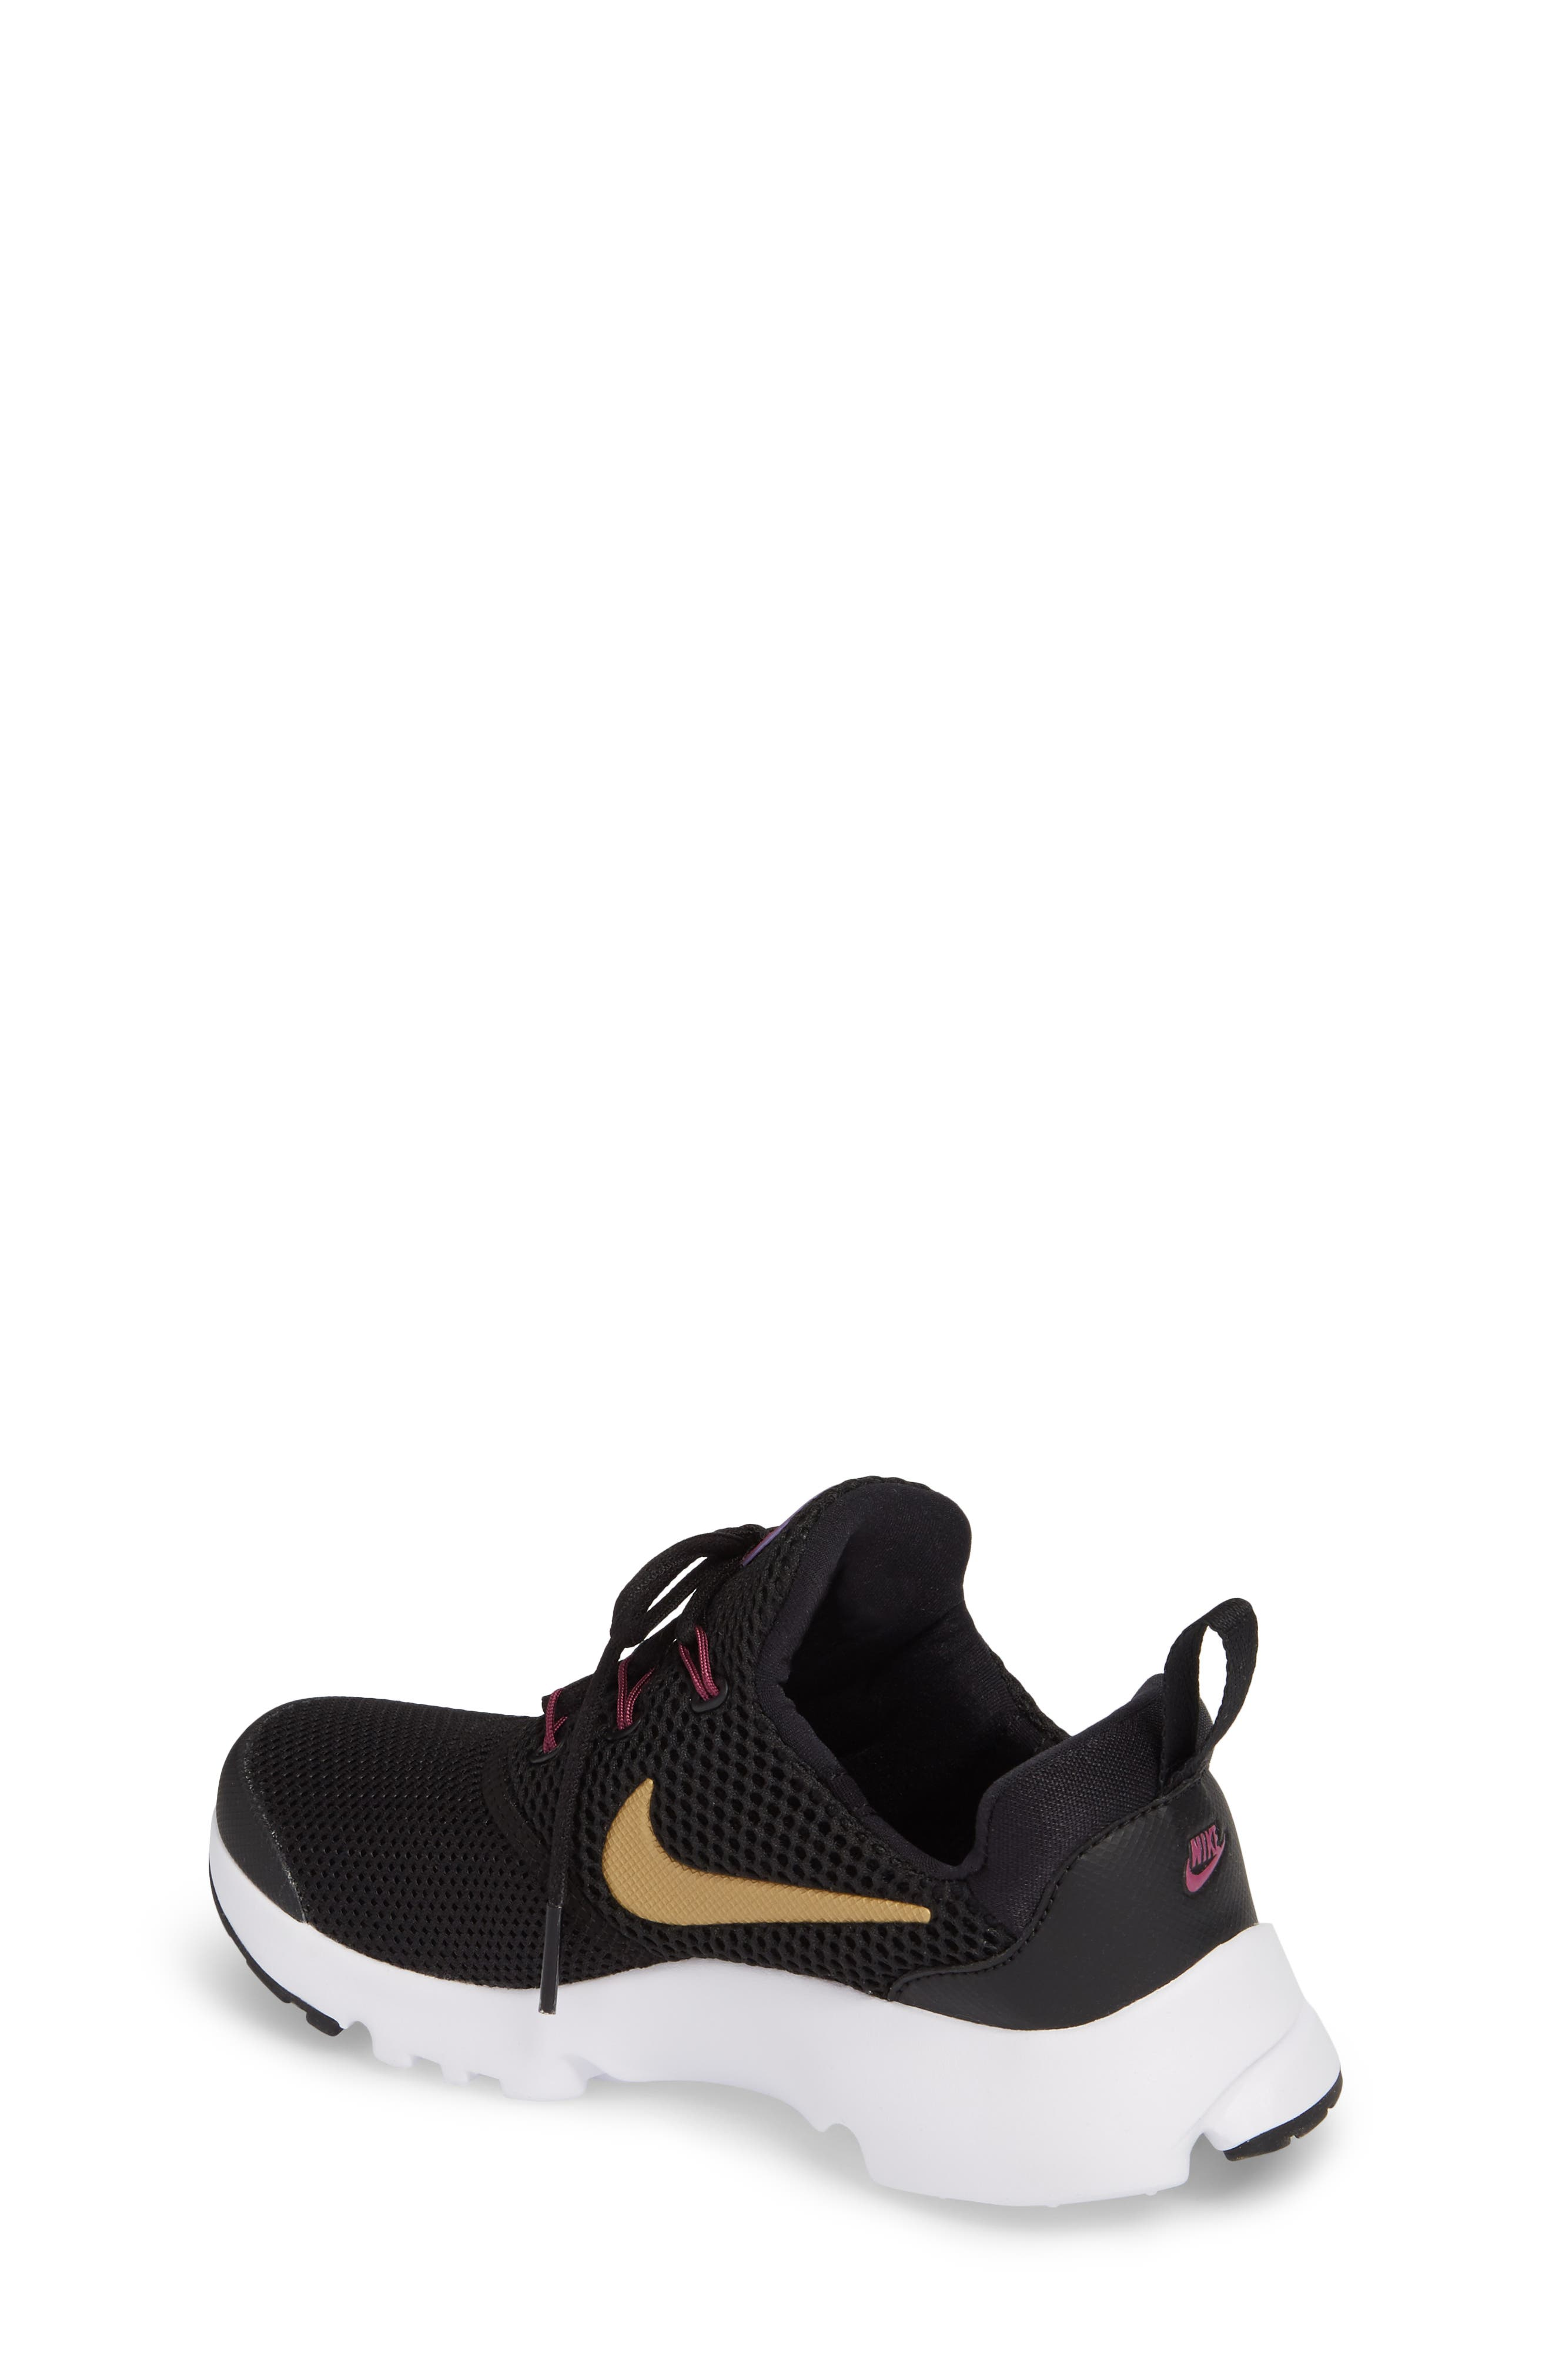 Presto Fly PS Sneaker,                             Alternate thumbnail 2, color,                             Black/ Gold